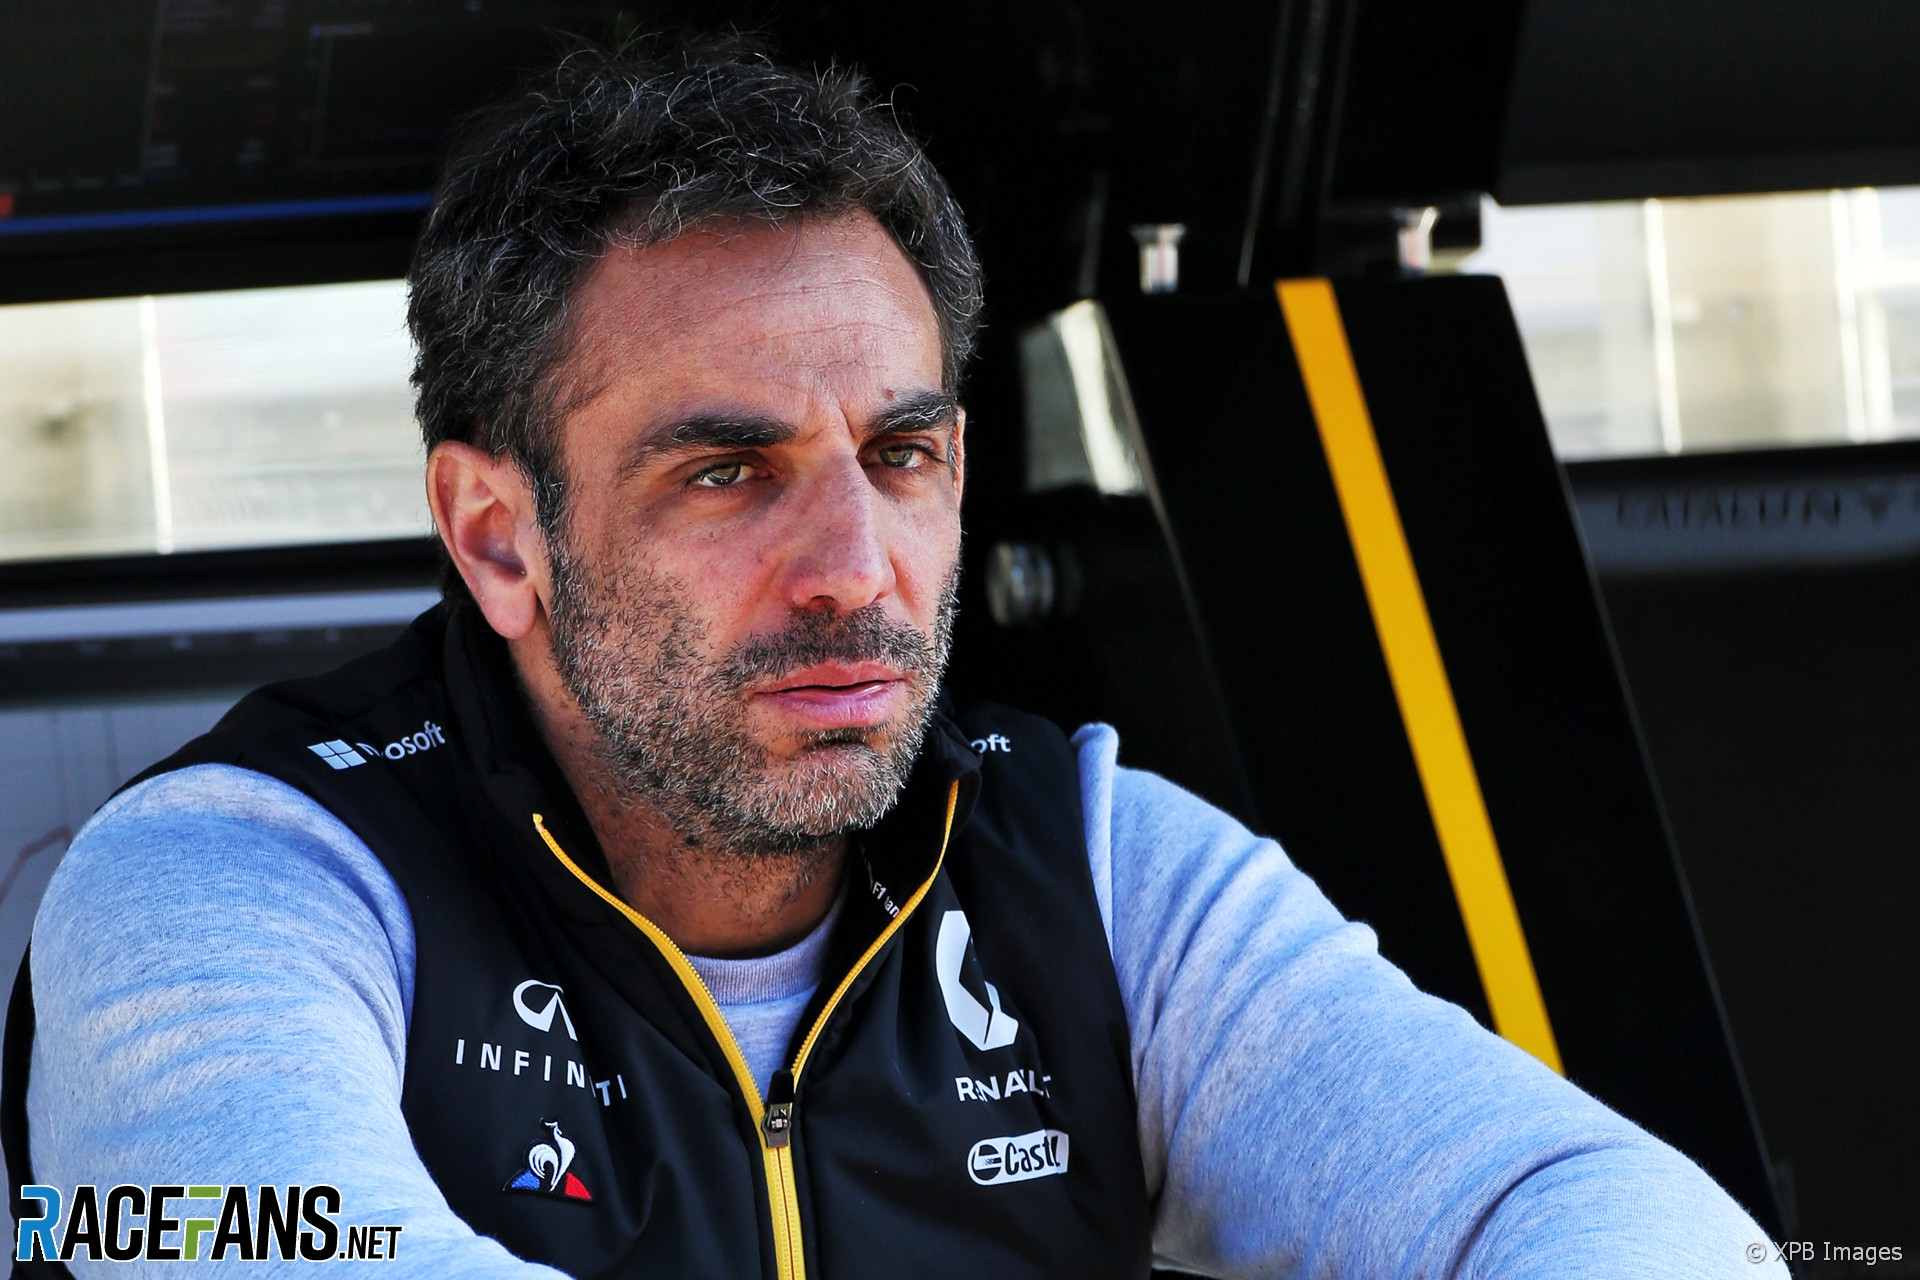 Cyril Abiteboul, Renault, 2020